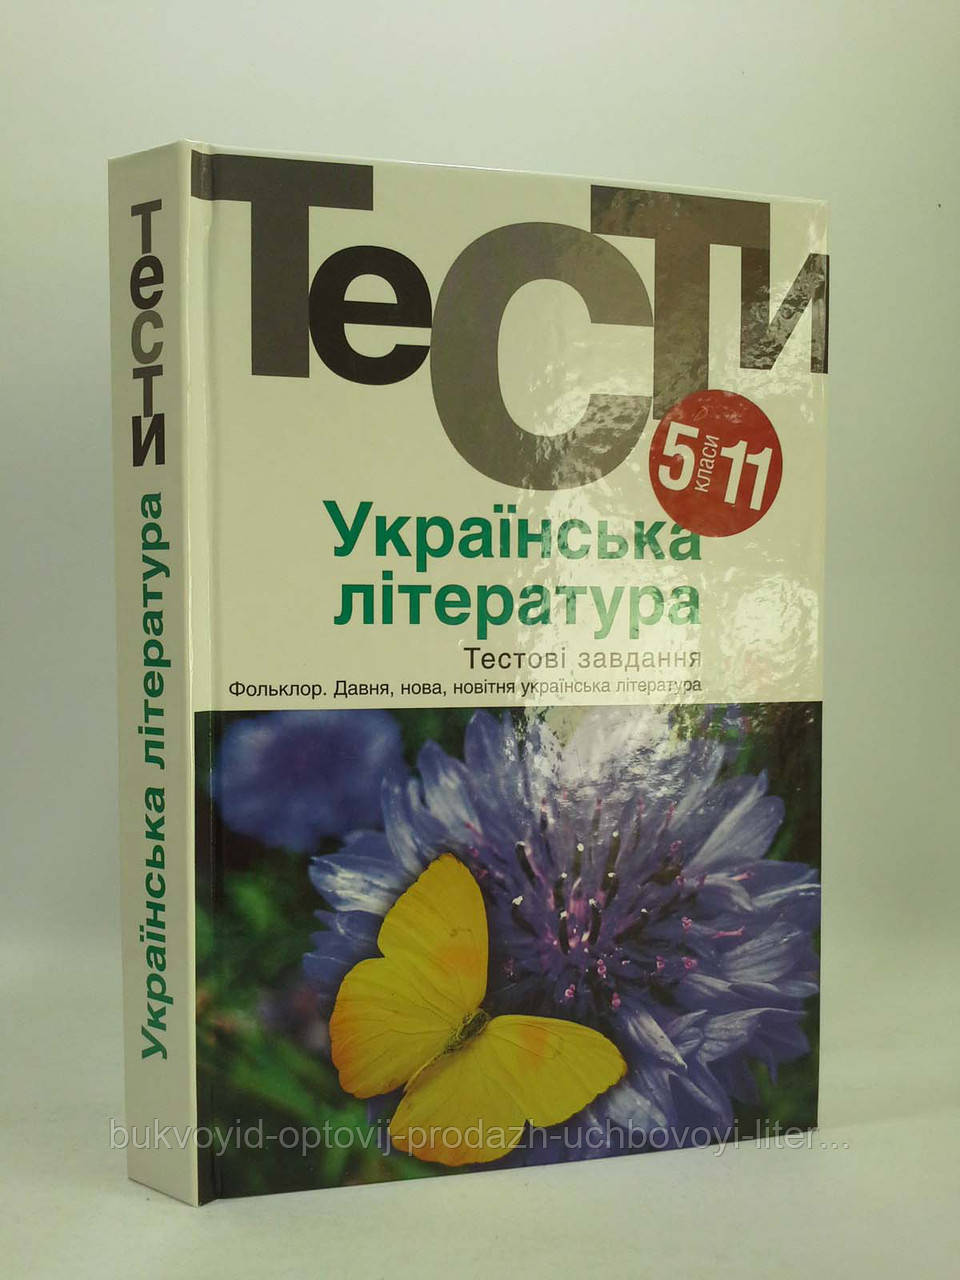 Тести Українська література 5 11 класи Бернадська Усатенко, фото 1